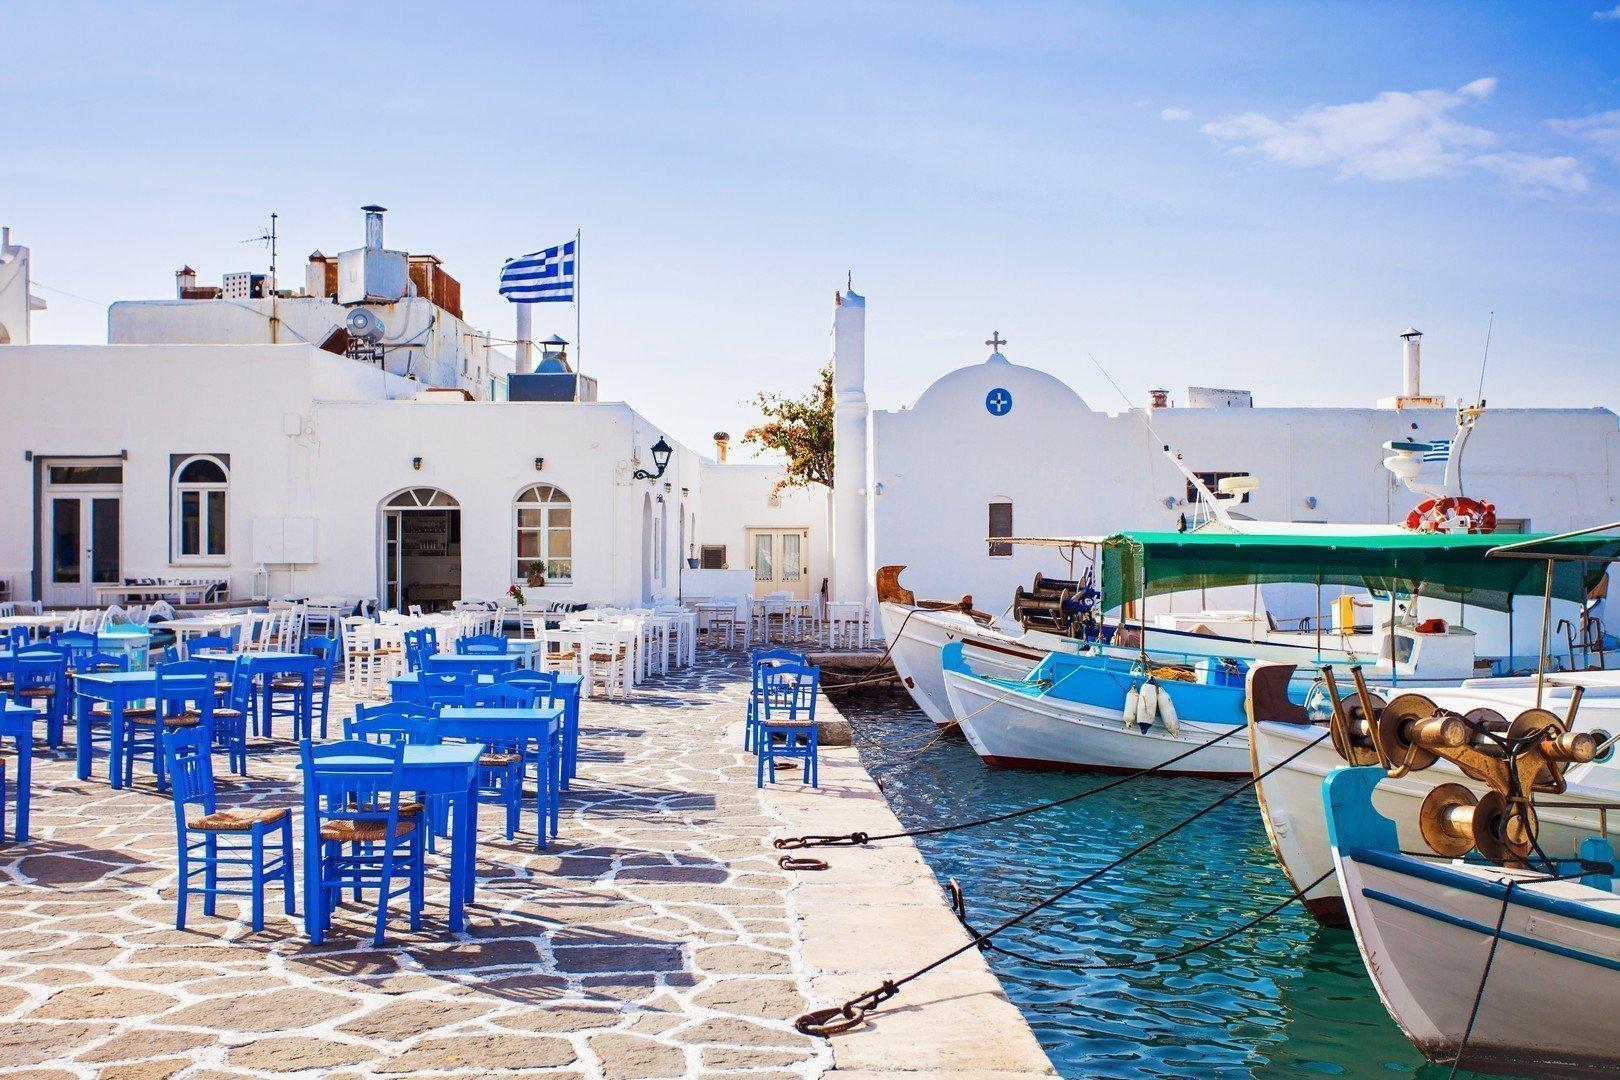 Greek fishing village in Paros, Naousa, Greece - Imagen shutterstock_336327542